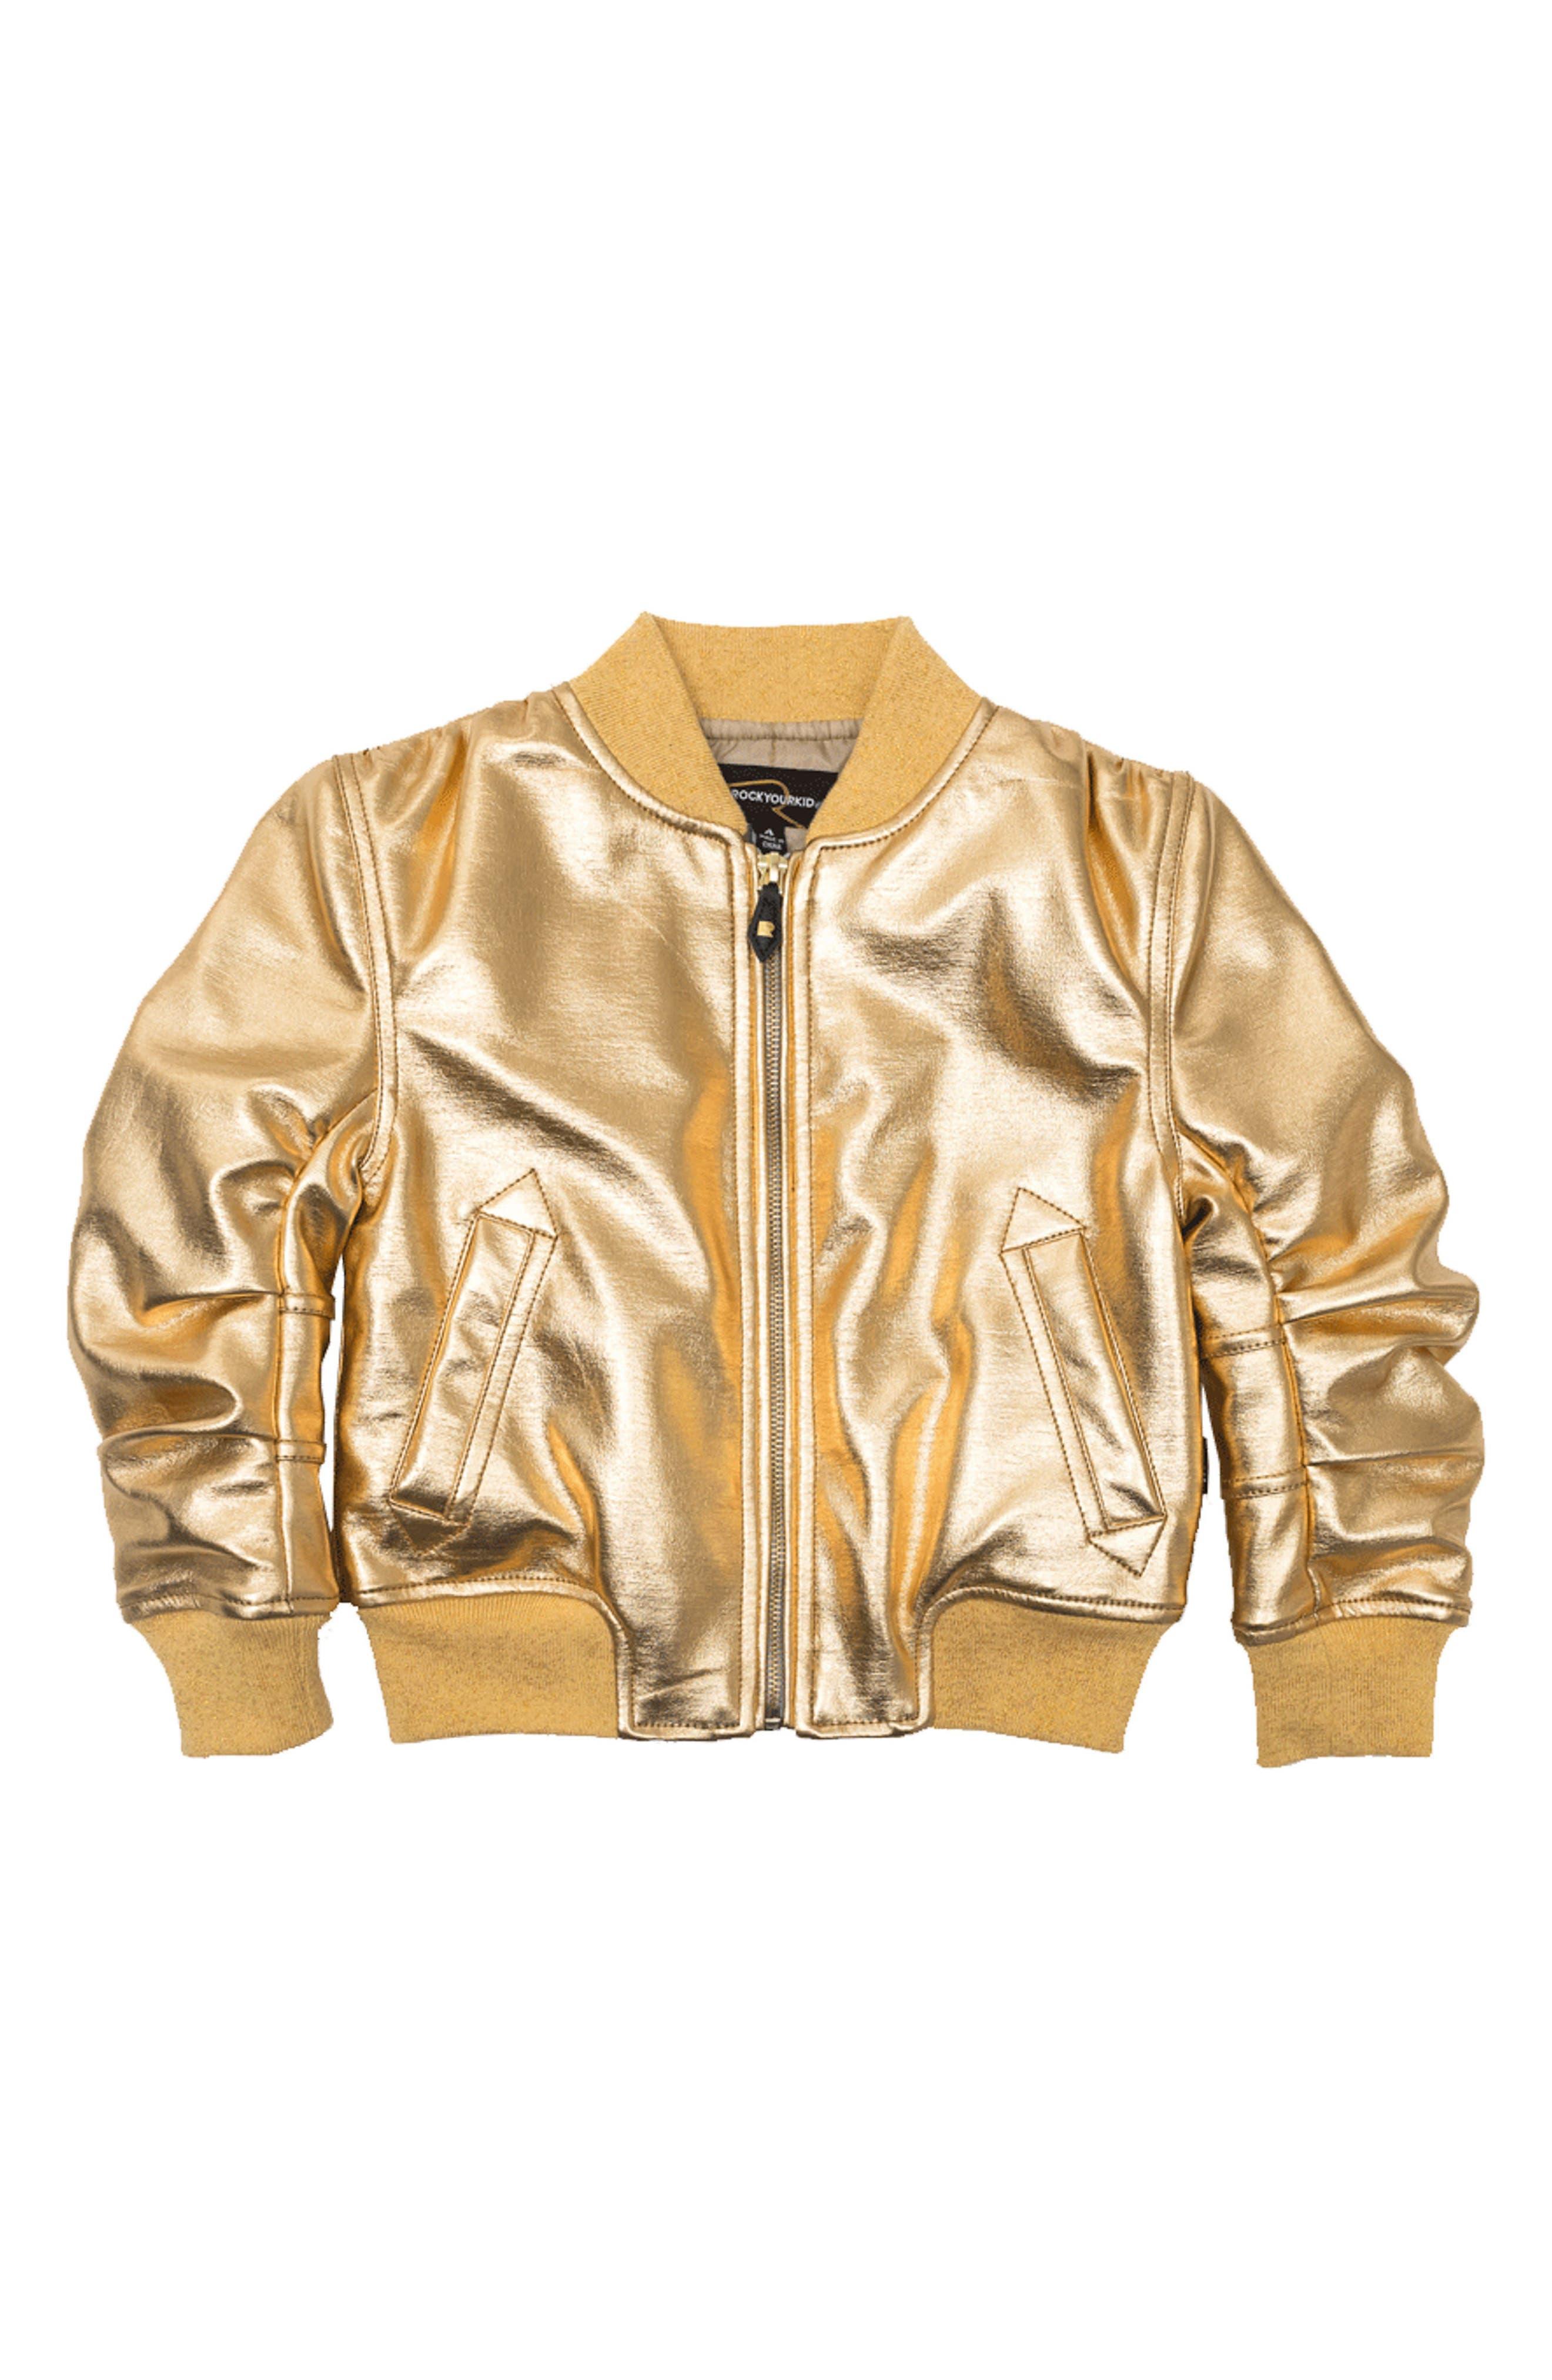 Studio 54 Bomber Jacket,                             Main thumbnail 1, color,                             Gold